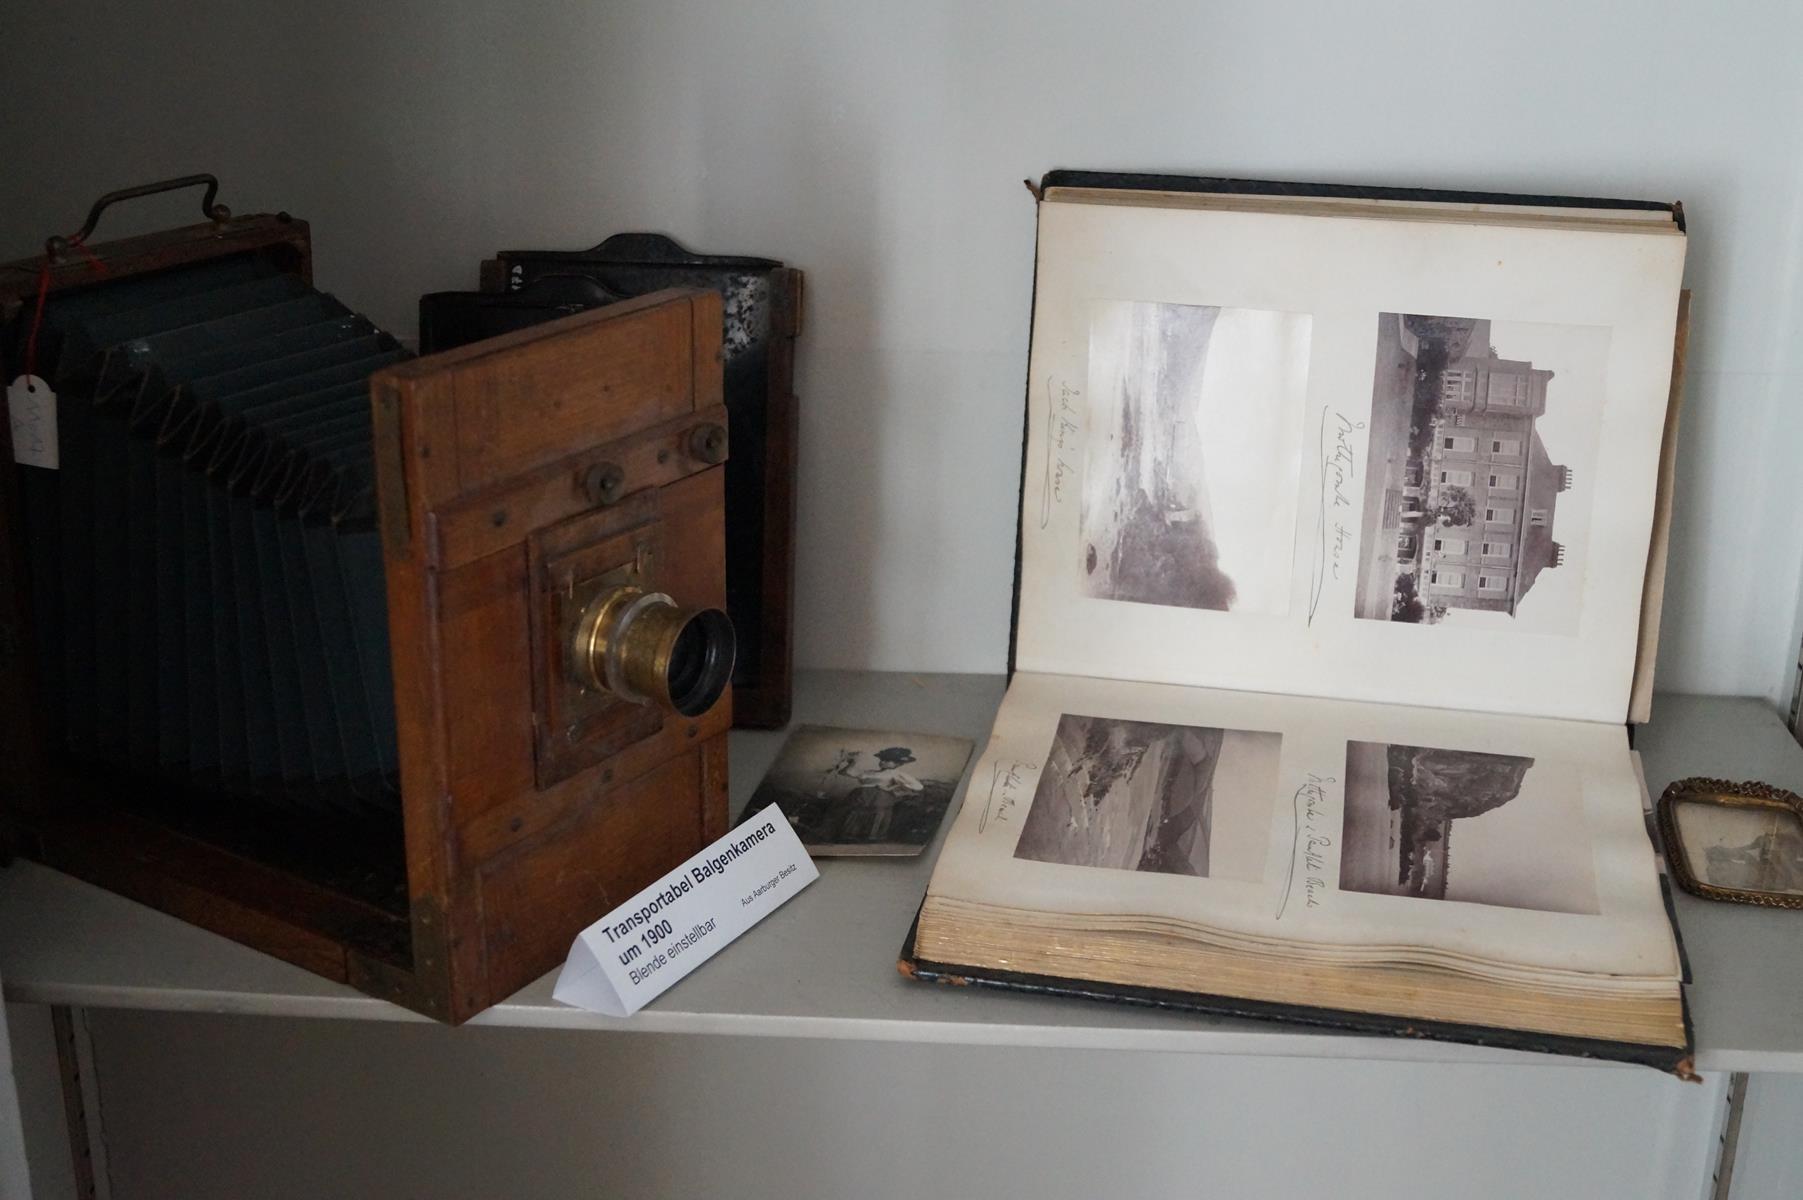 Photographie im 19. Jahrhundert